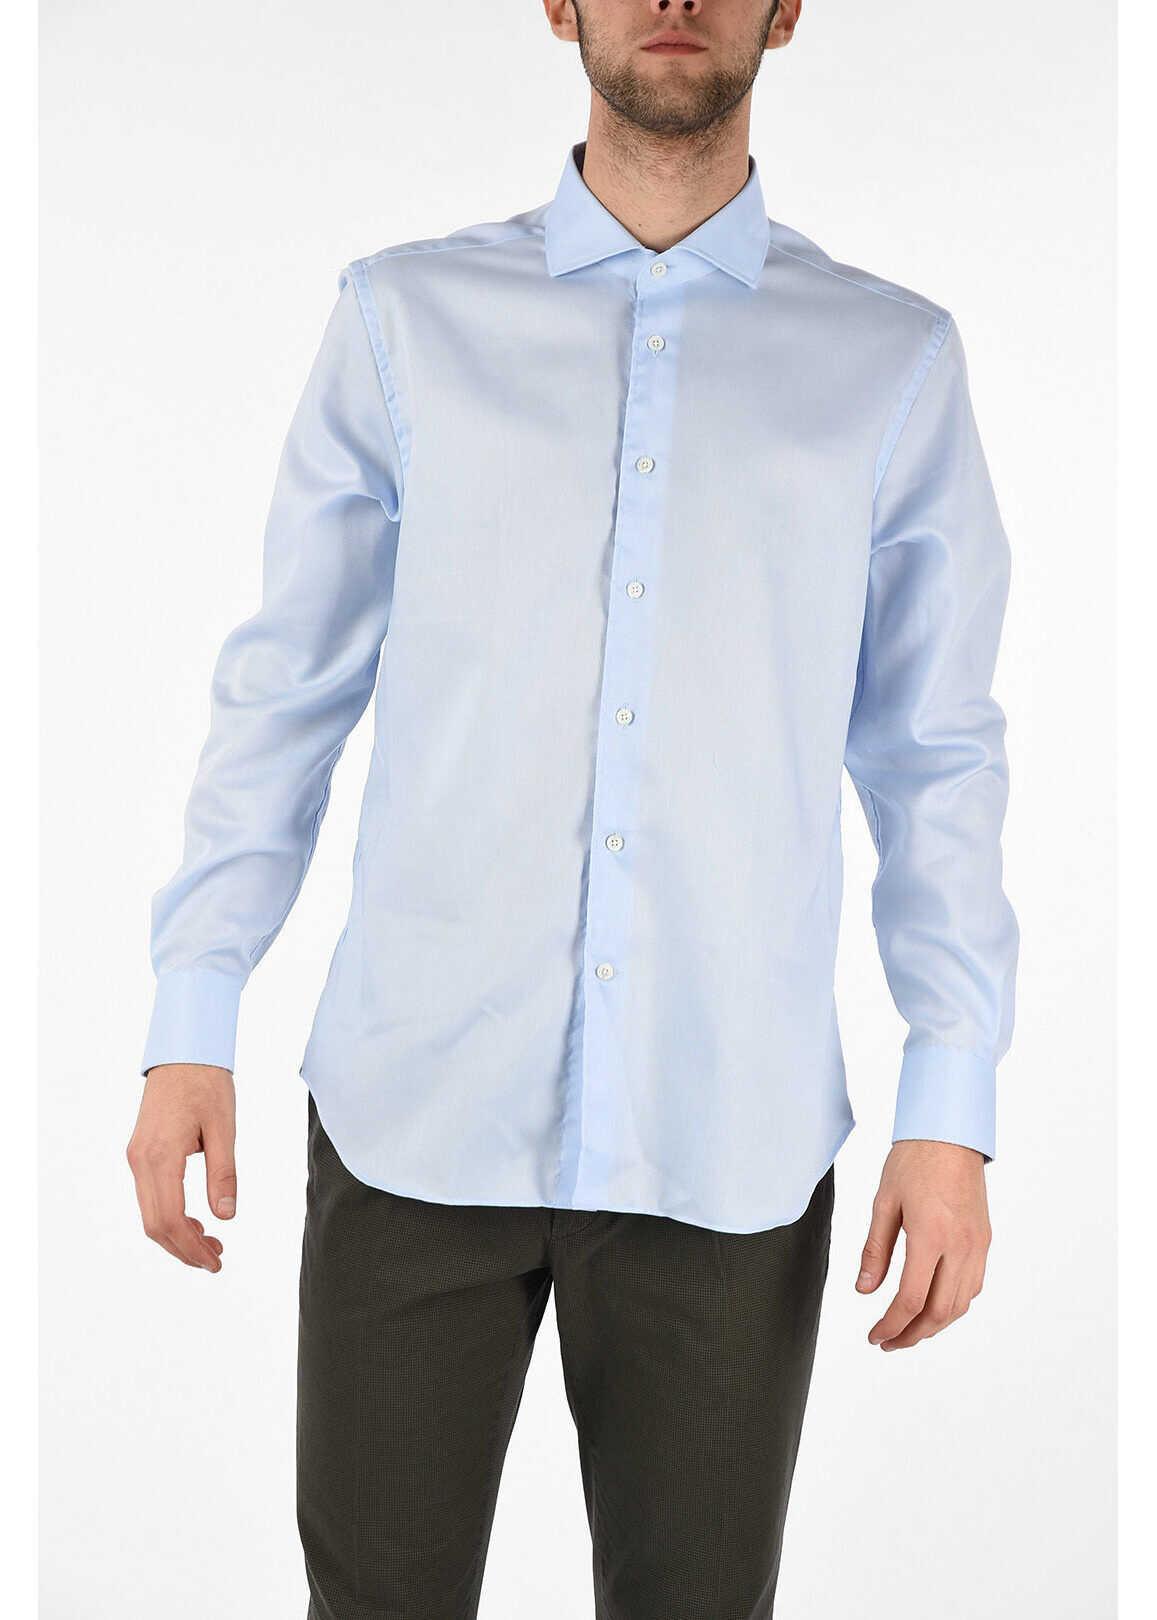 CORNELIANI Cotton popeline semi-french collar shirt LIGHT BLUE imagine